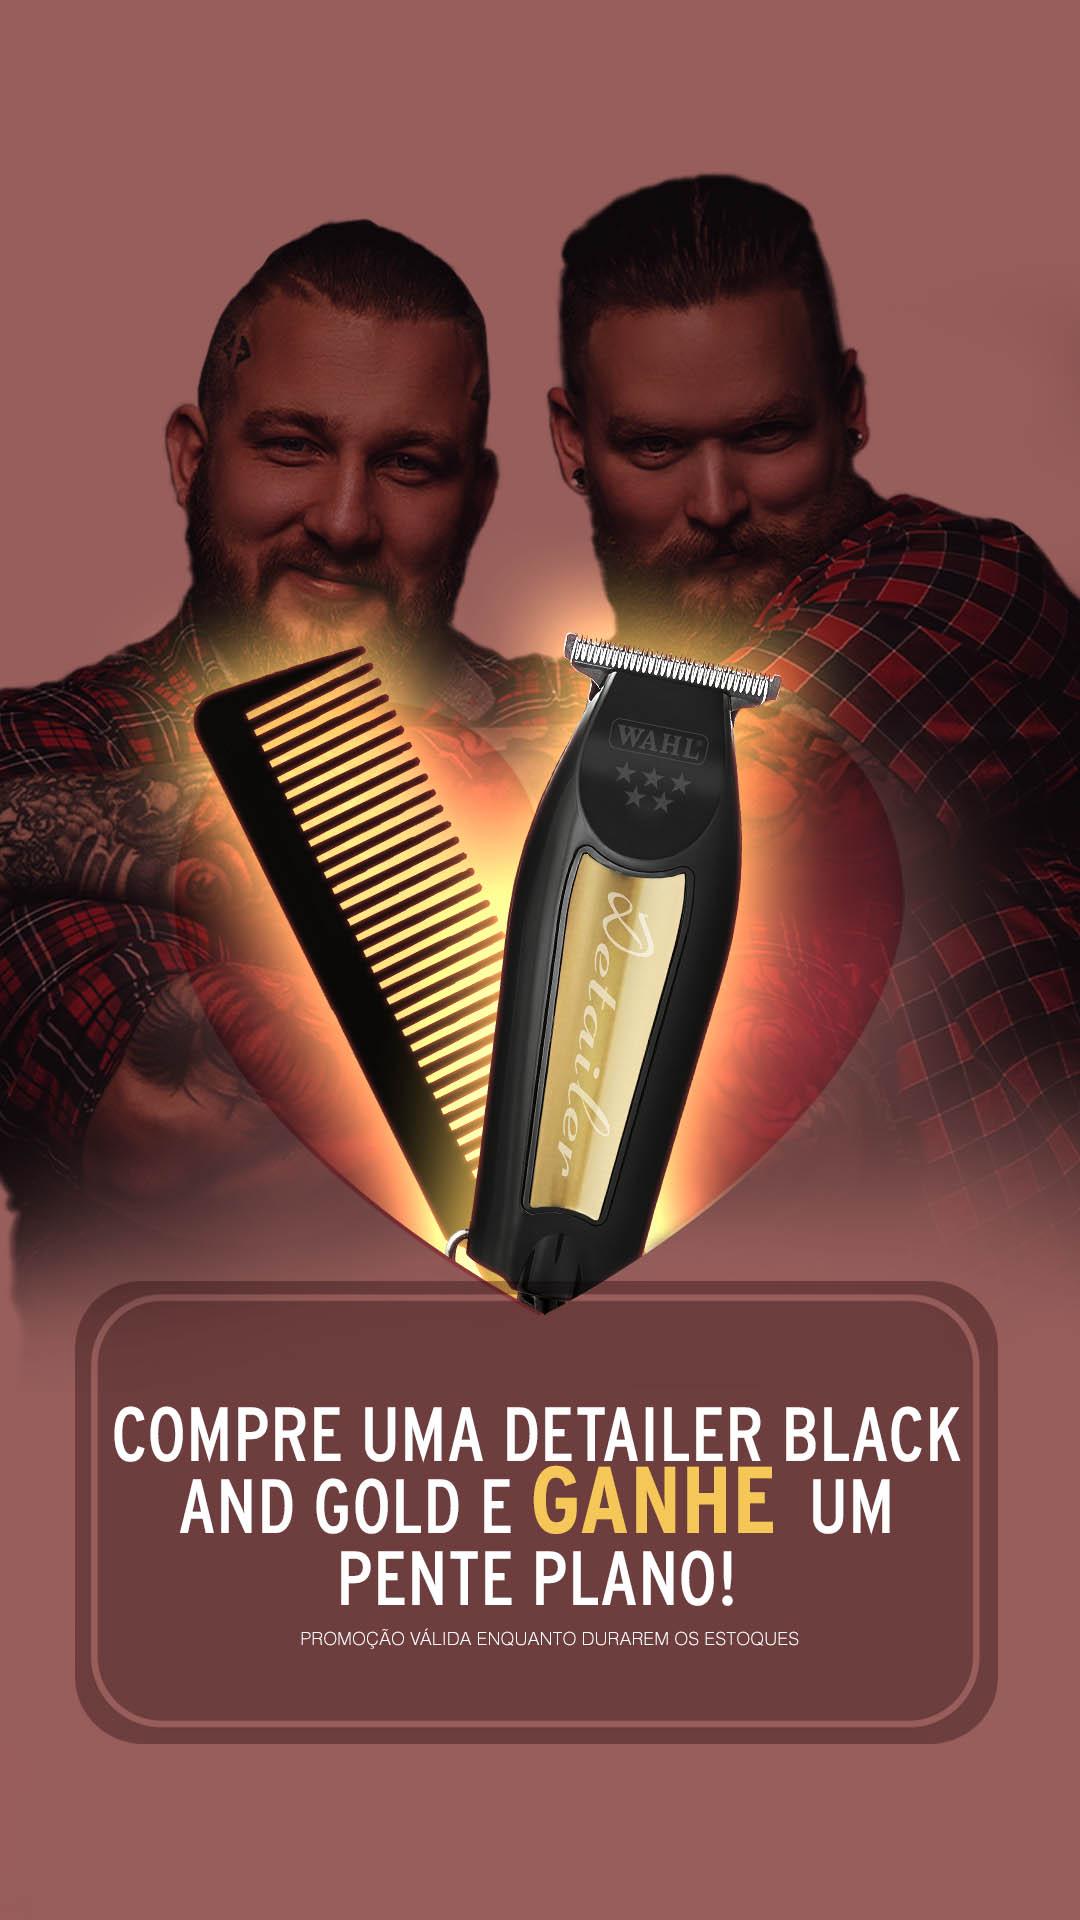 Detailer-Black-Pente-Mobile